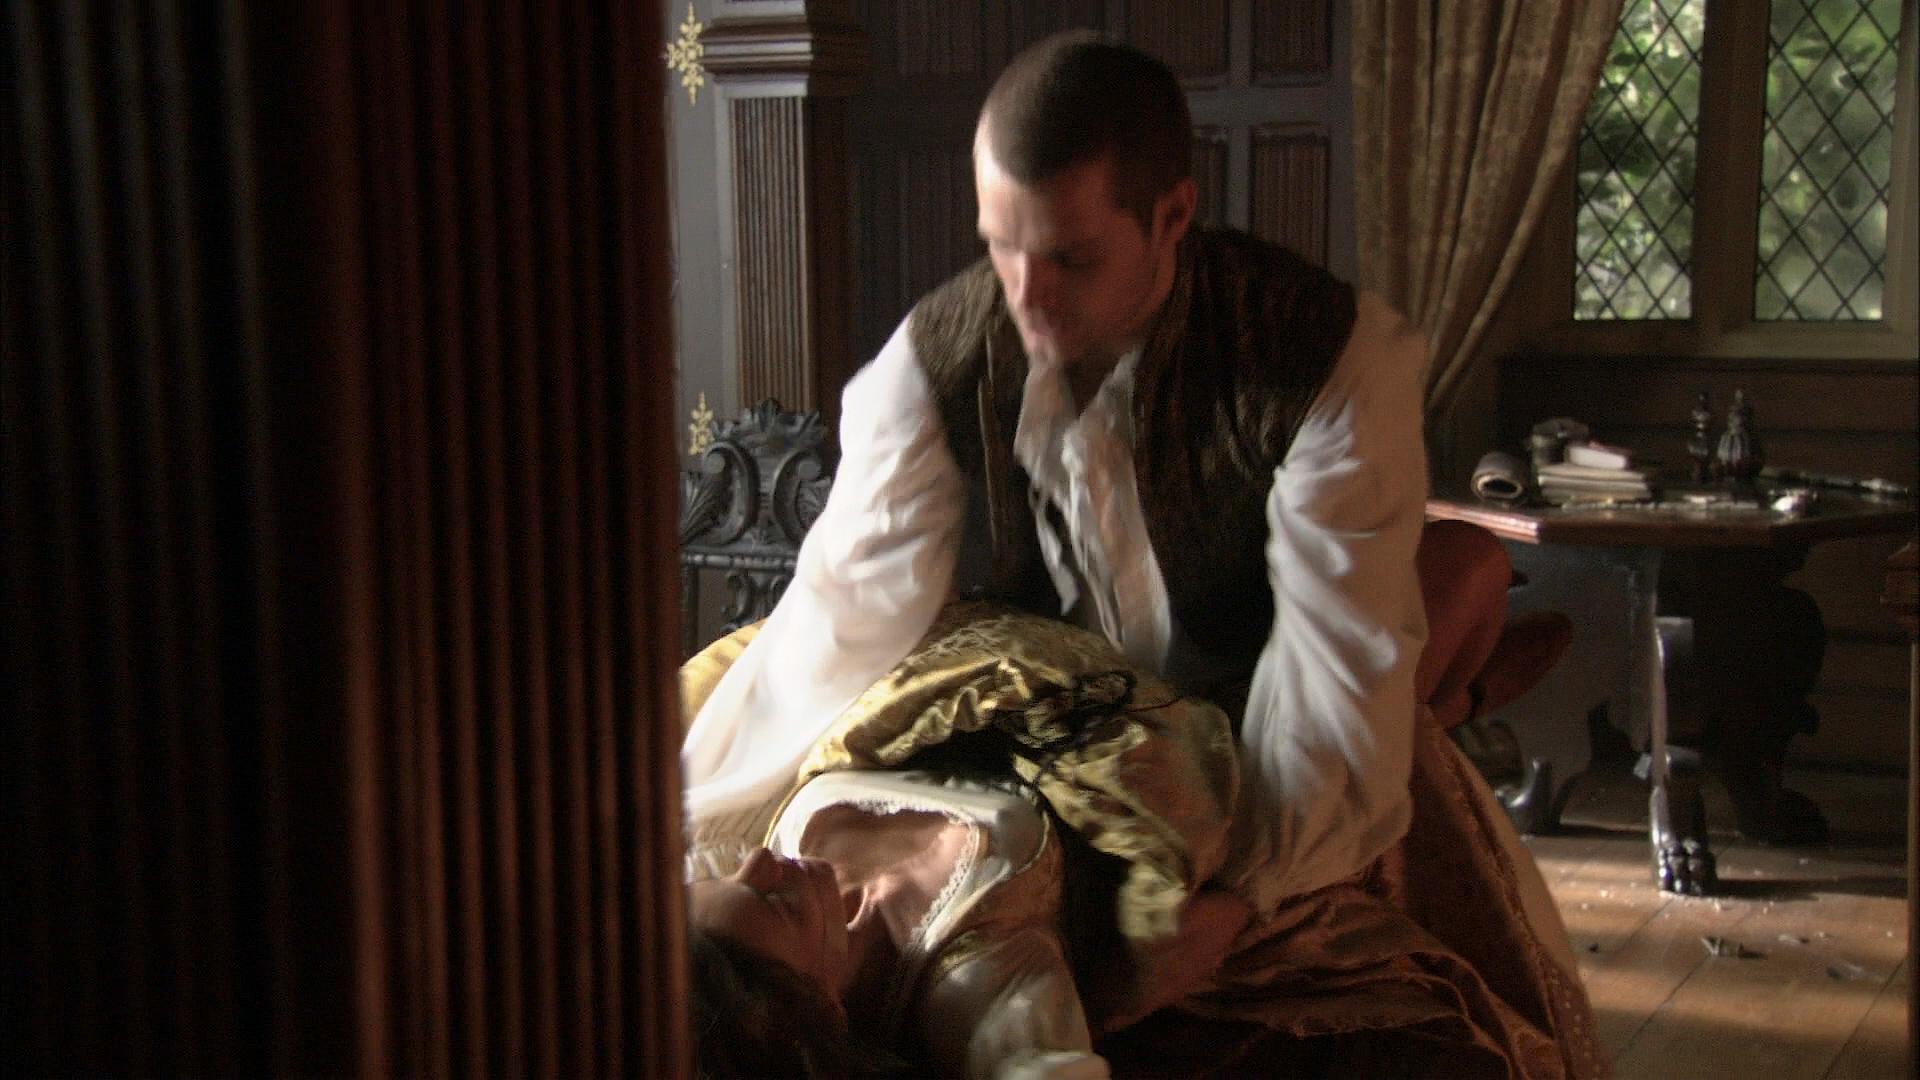 Natalie Dormer hot sex and Gabrielle Anwar hot - The Tudors (2007) S01E05 HD 1080p (11)